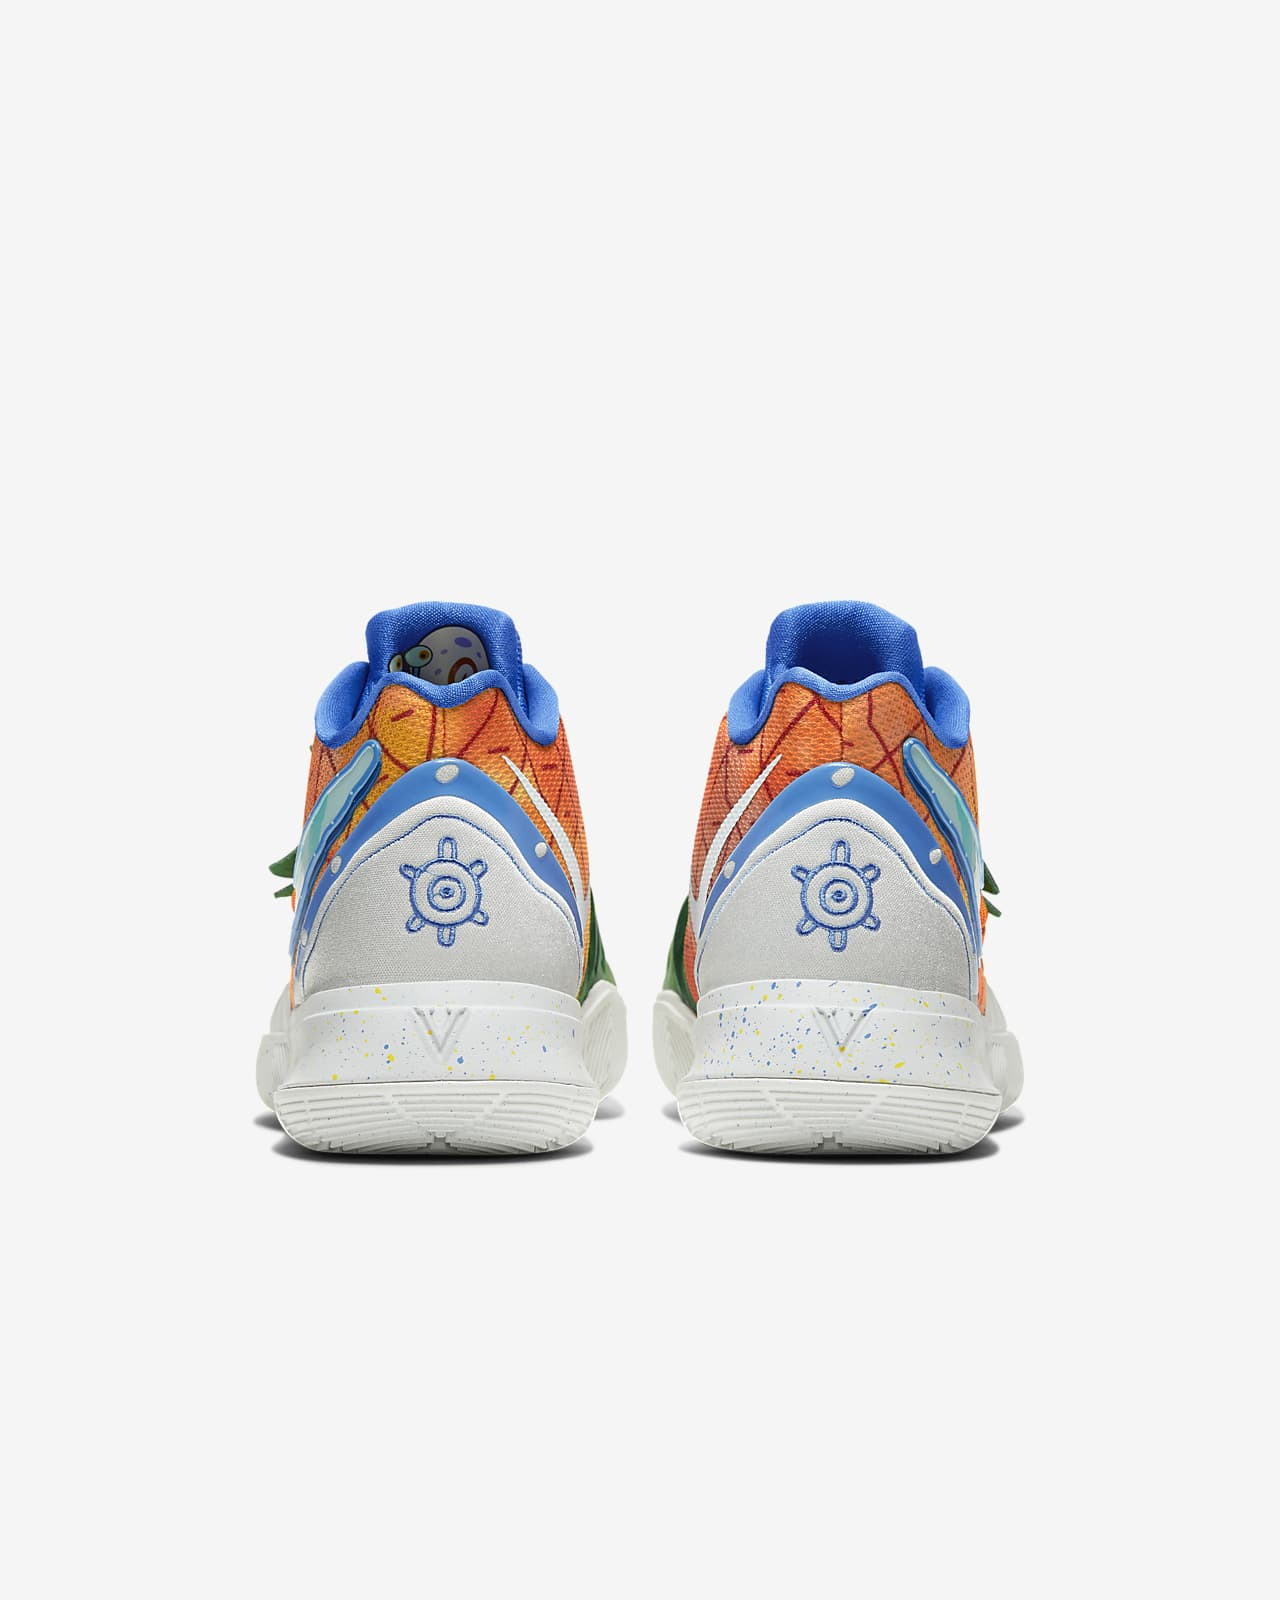 ep, Fake Nike Kyrie 5 ep Shoes Sale